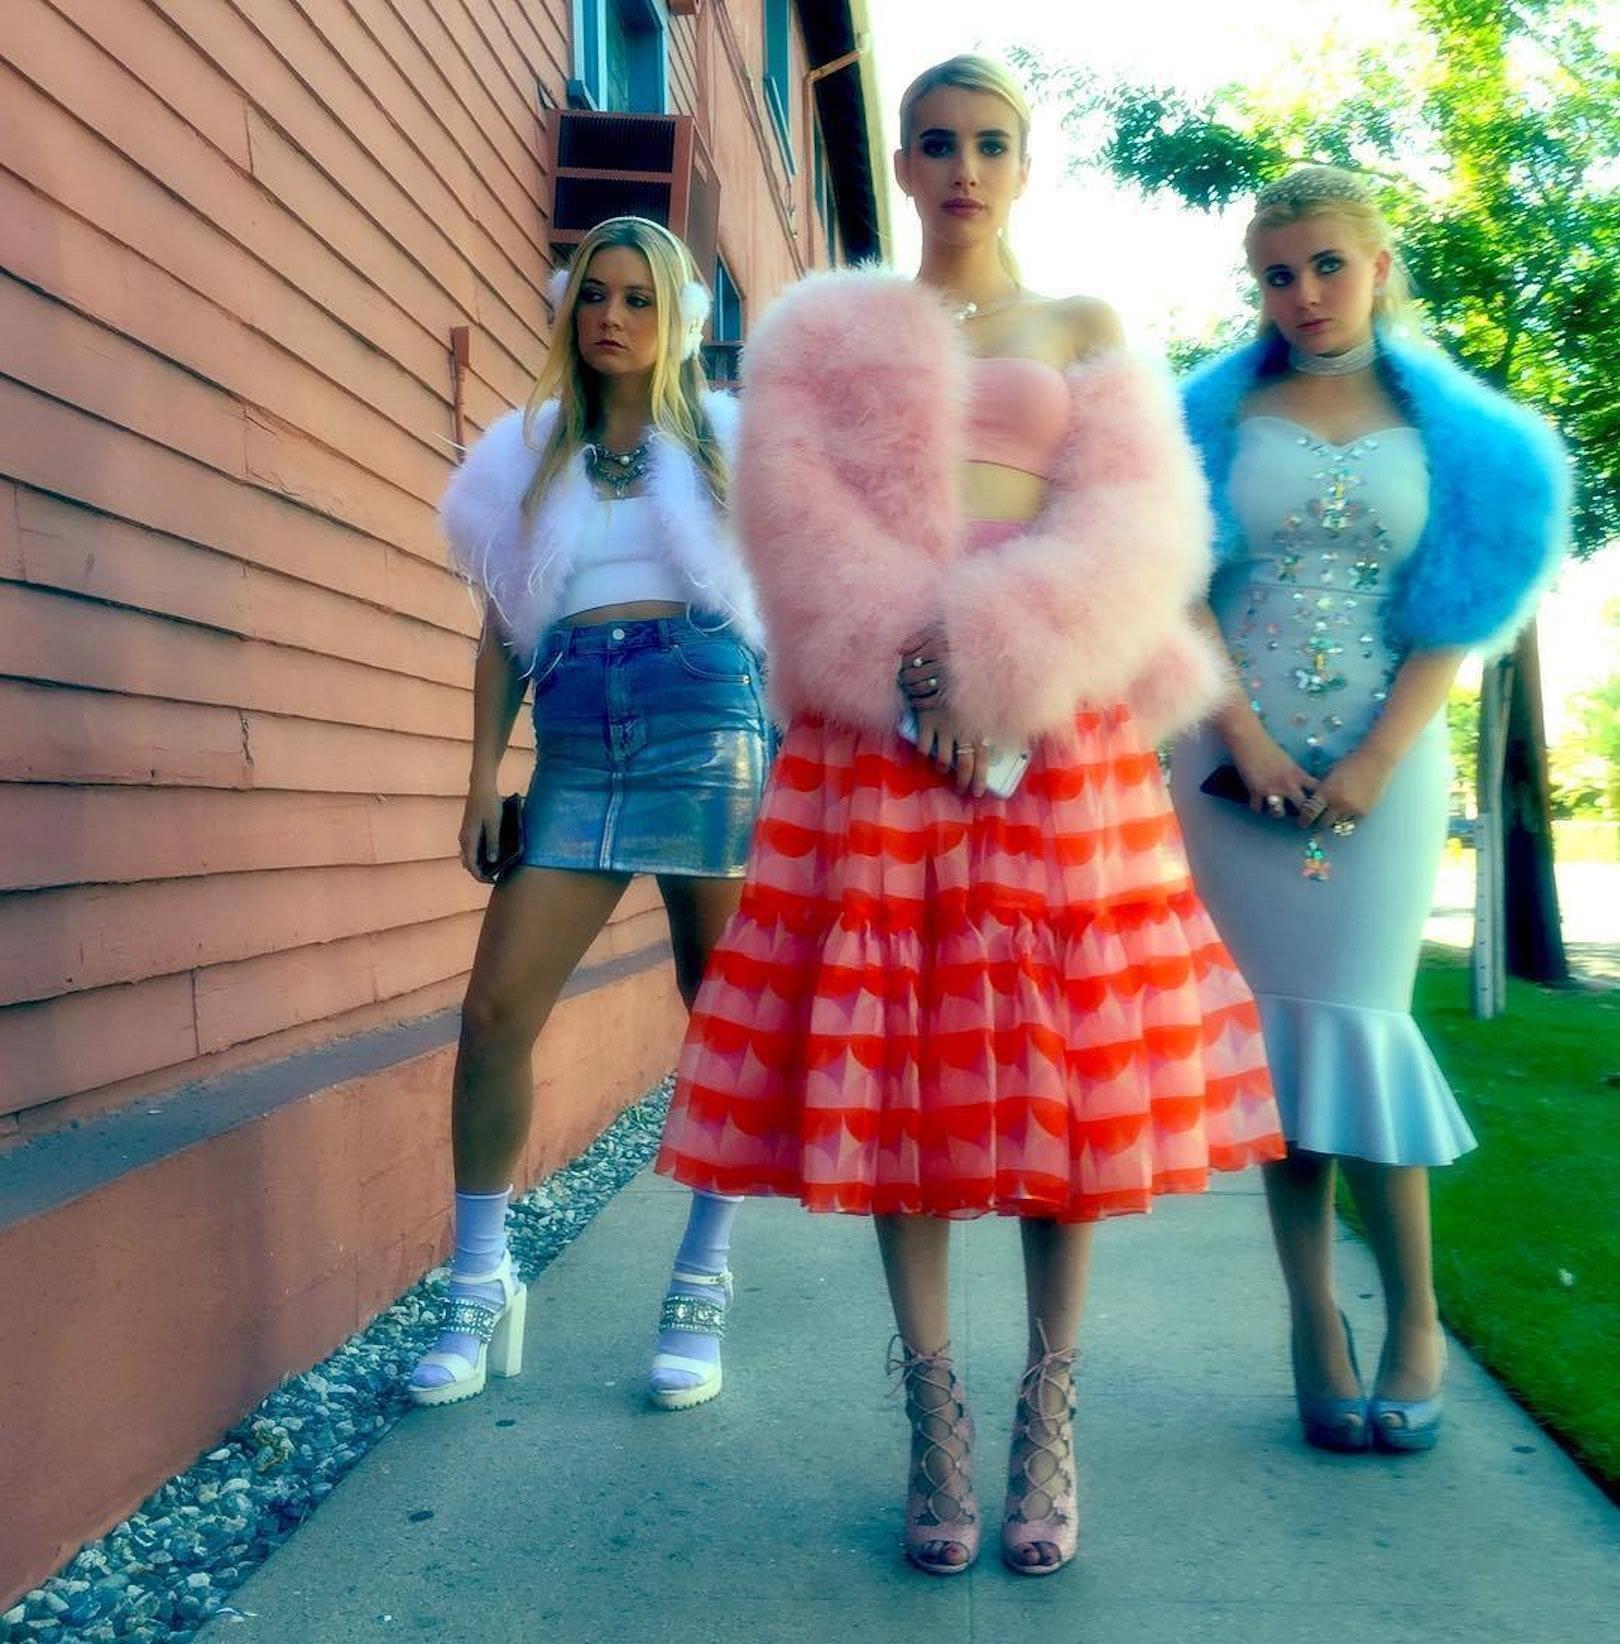 Billie Lourd, Emma Roberts, and Abigail Breslin